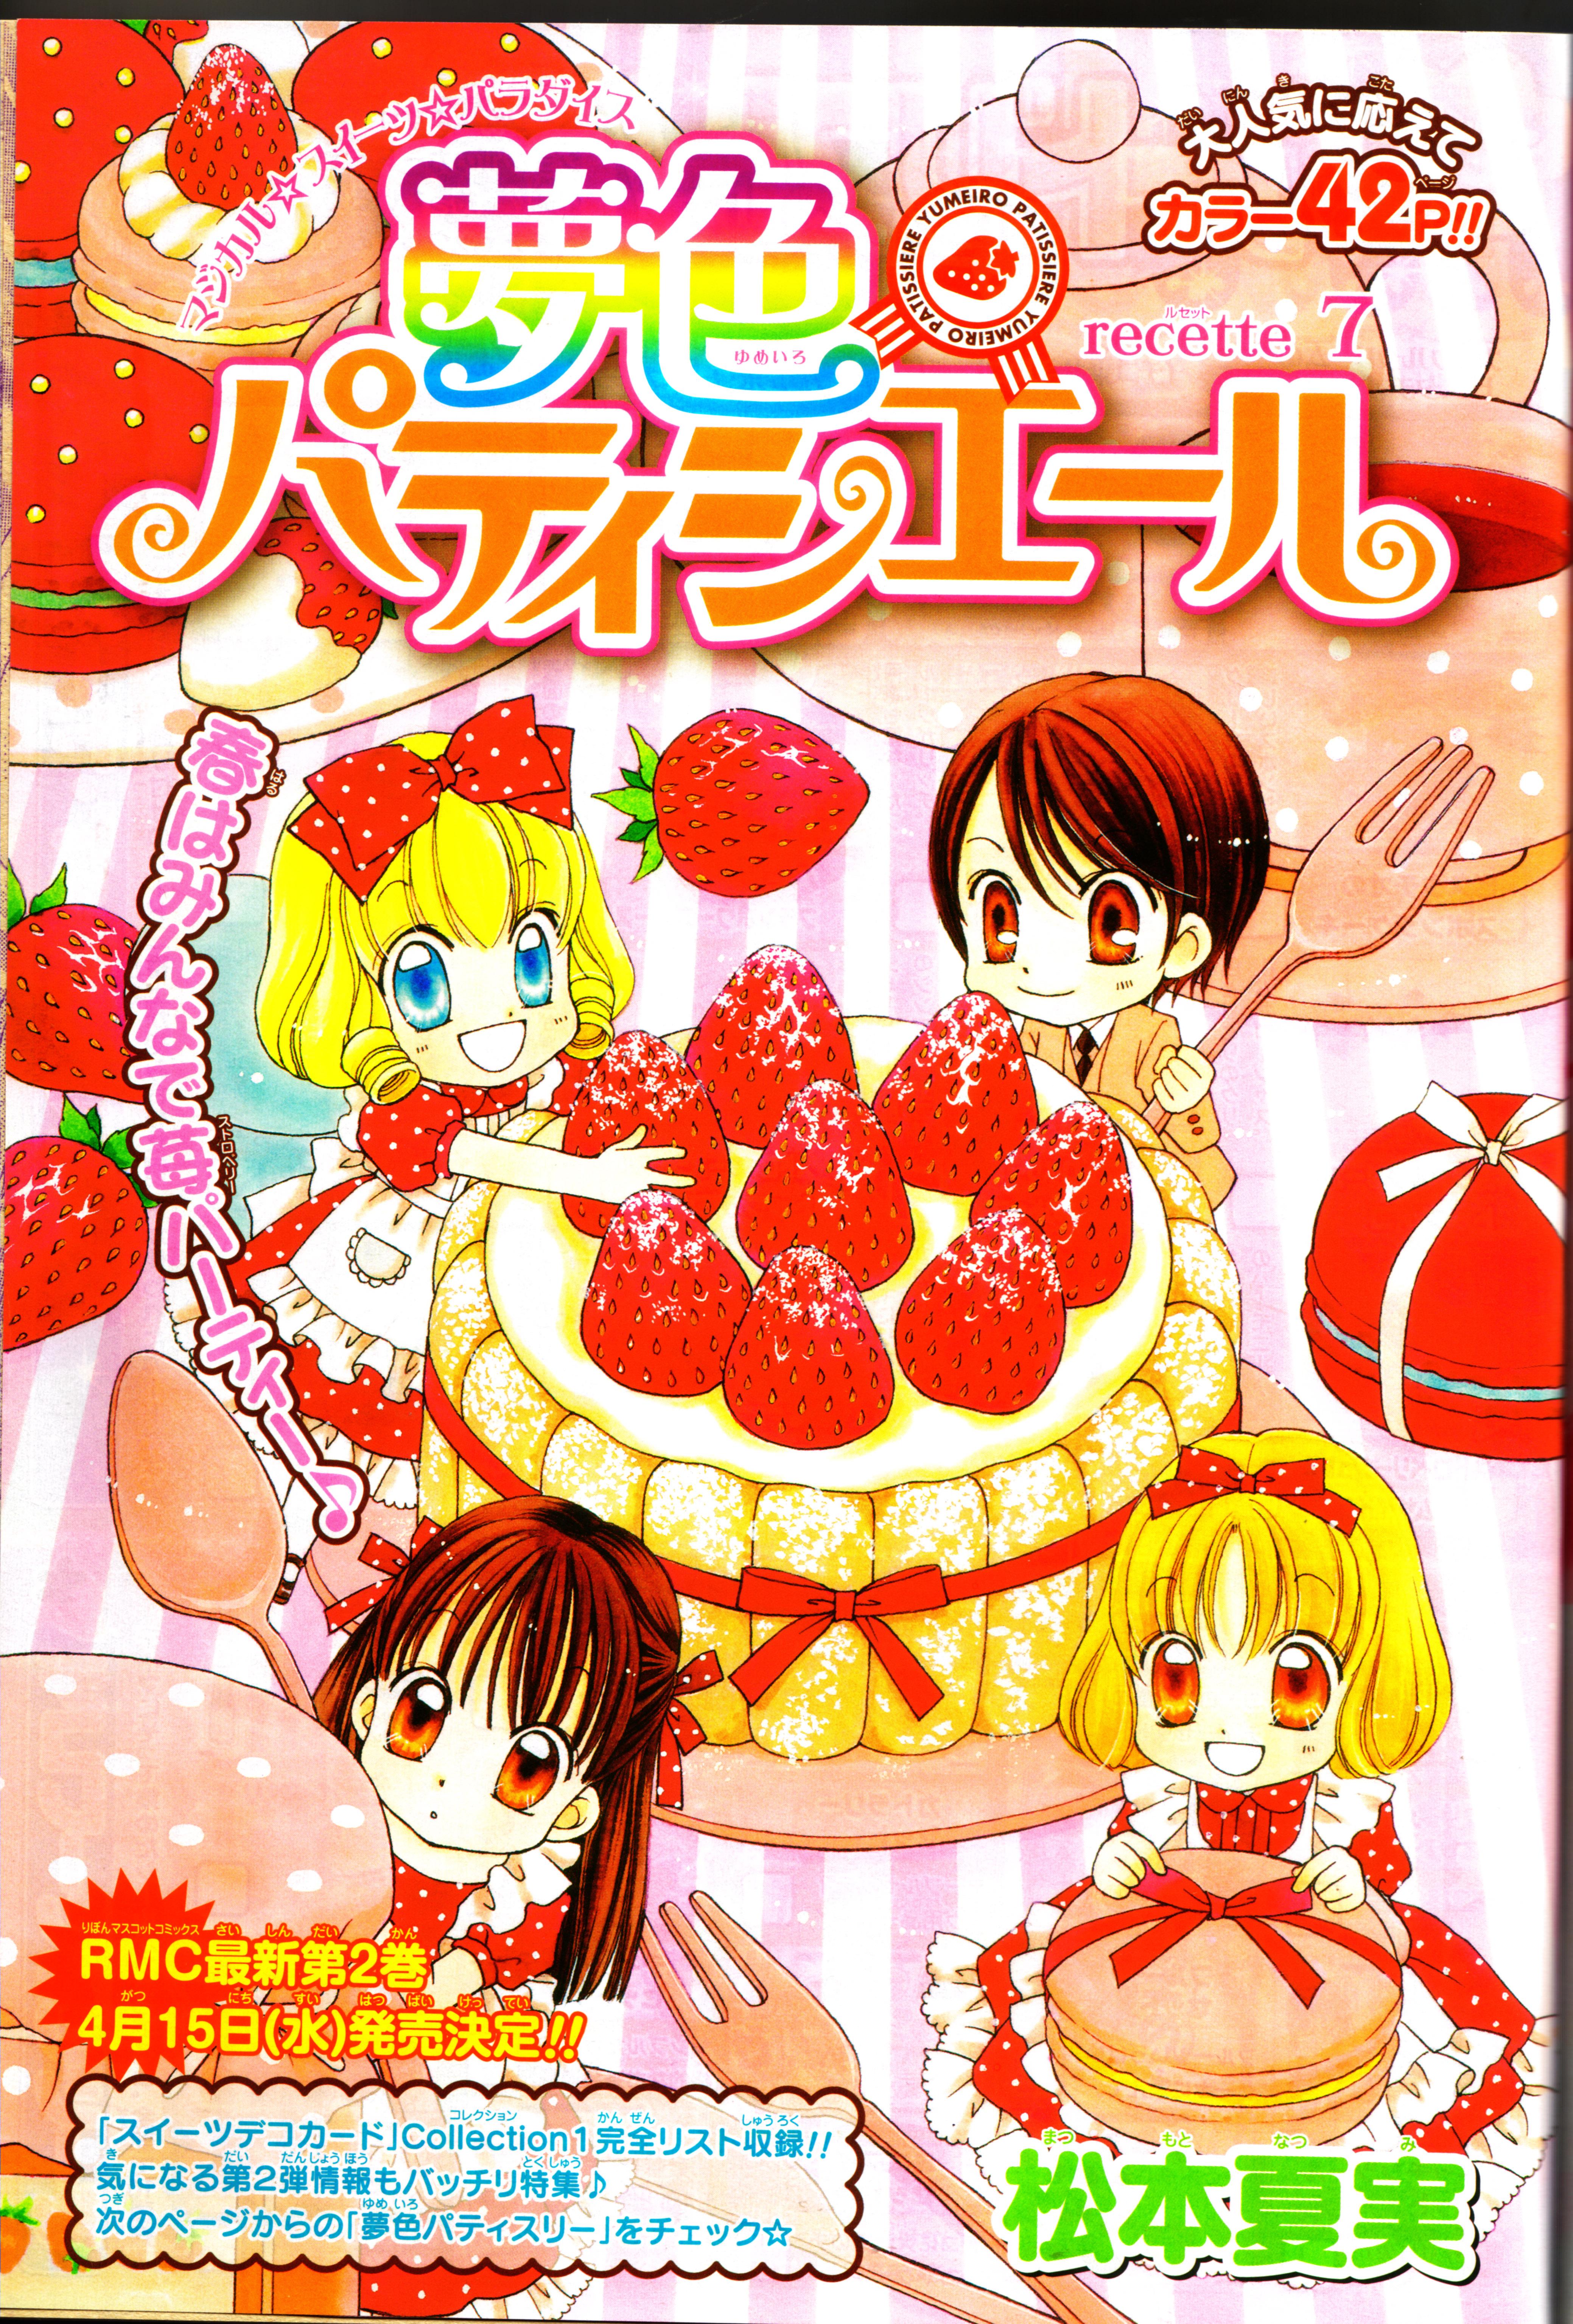 Yumeiro Pâtissière | page 3 of 5 - Zerochan Anime Image Board